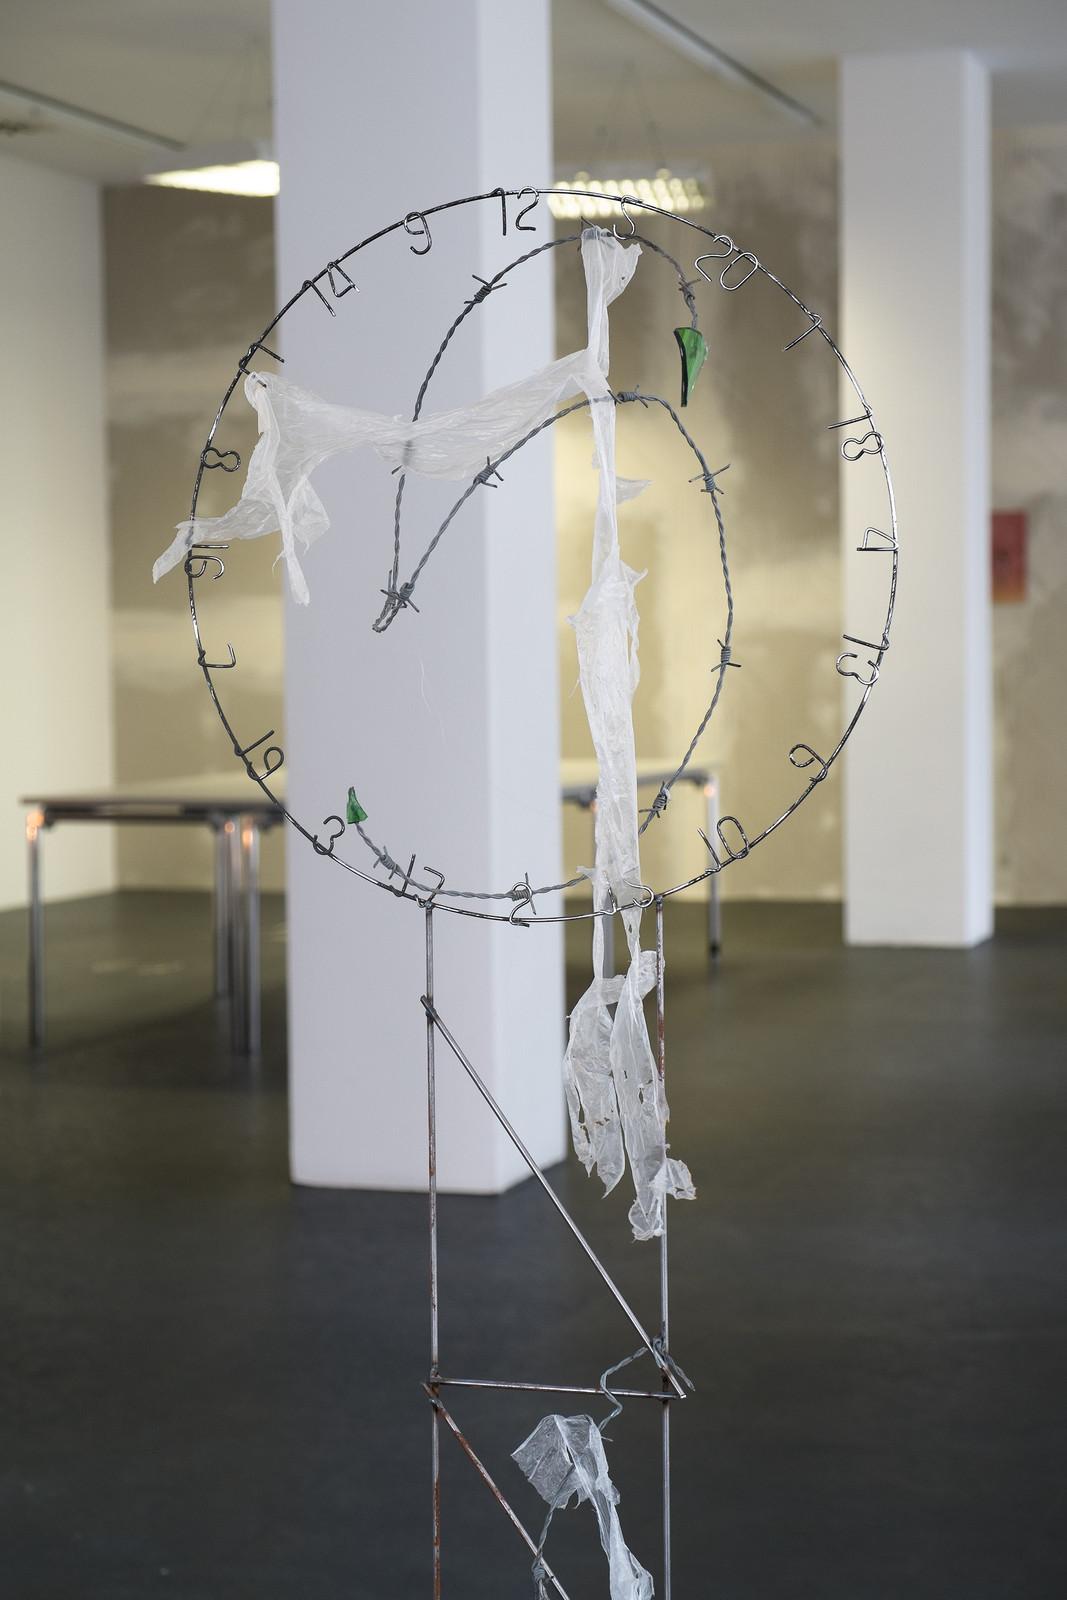 18.1_Frieder Haller_Spottgeburt, Detail_ICHTS_2016_Dortmunder Kunstverein_Foto Niklas Taleb